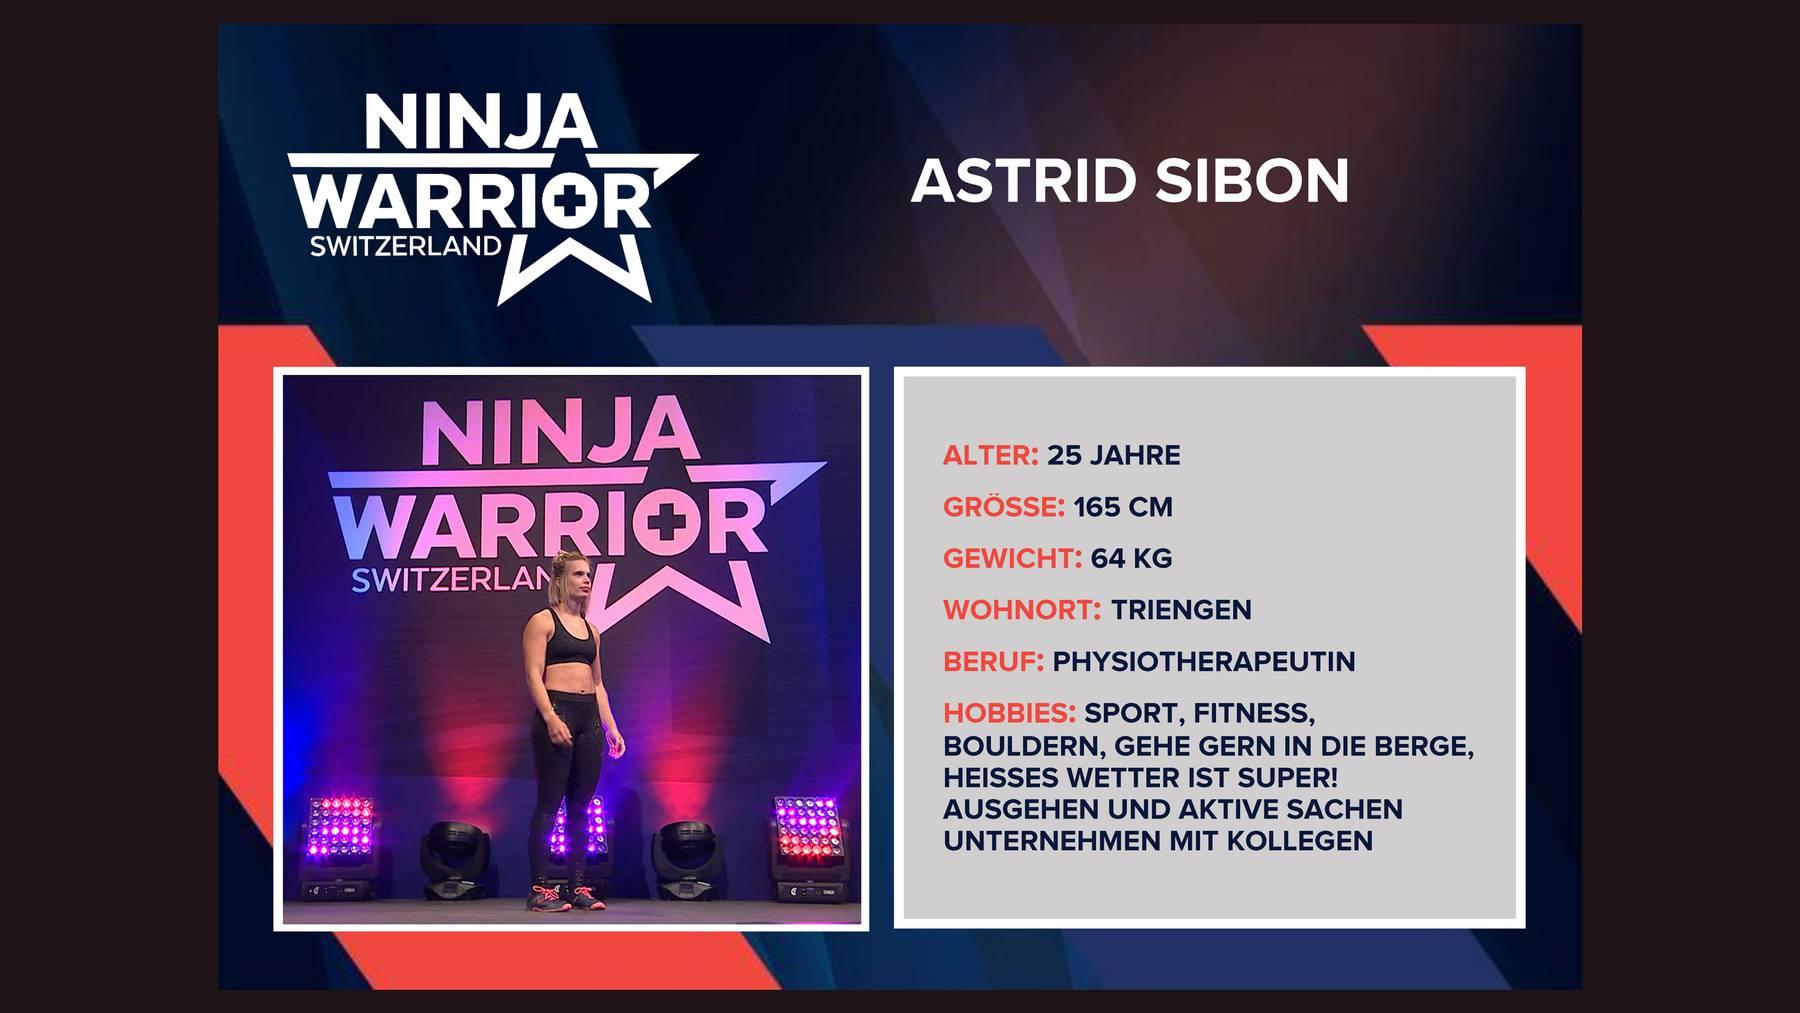 Astrid Sibon